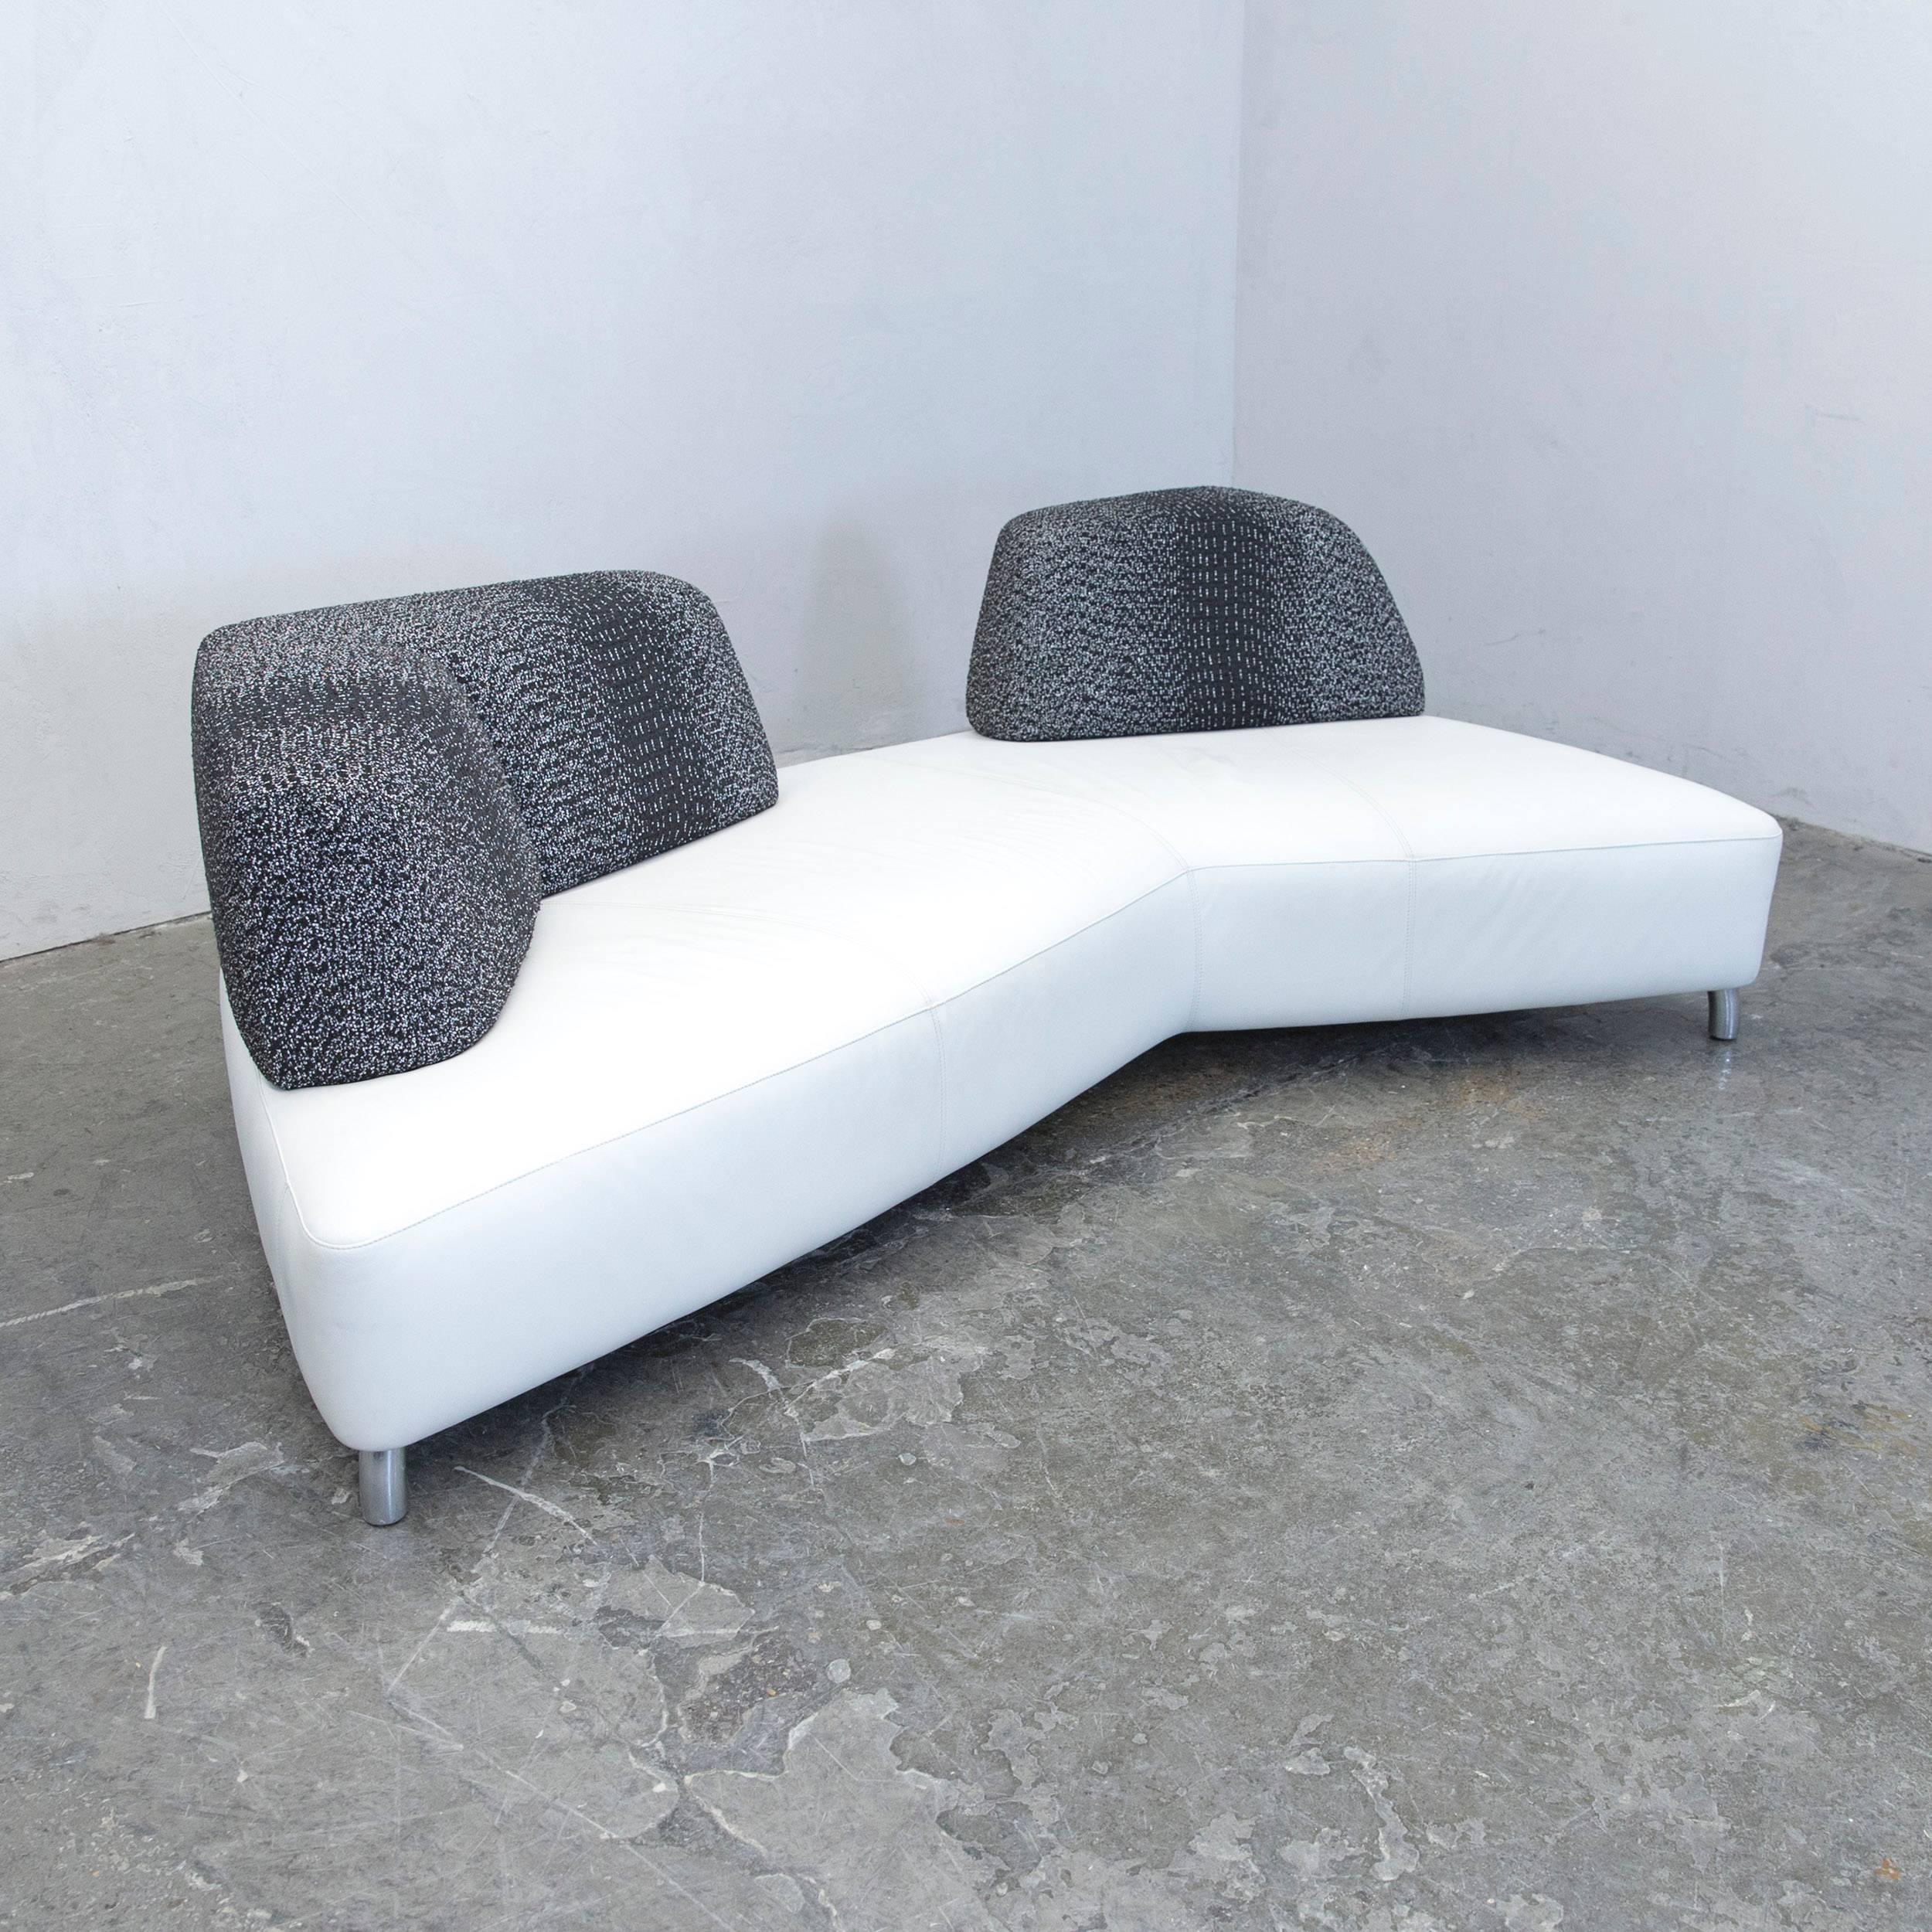 German Leolux Designer Sofa Set Leather White Black Couch Modern For Sale